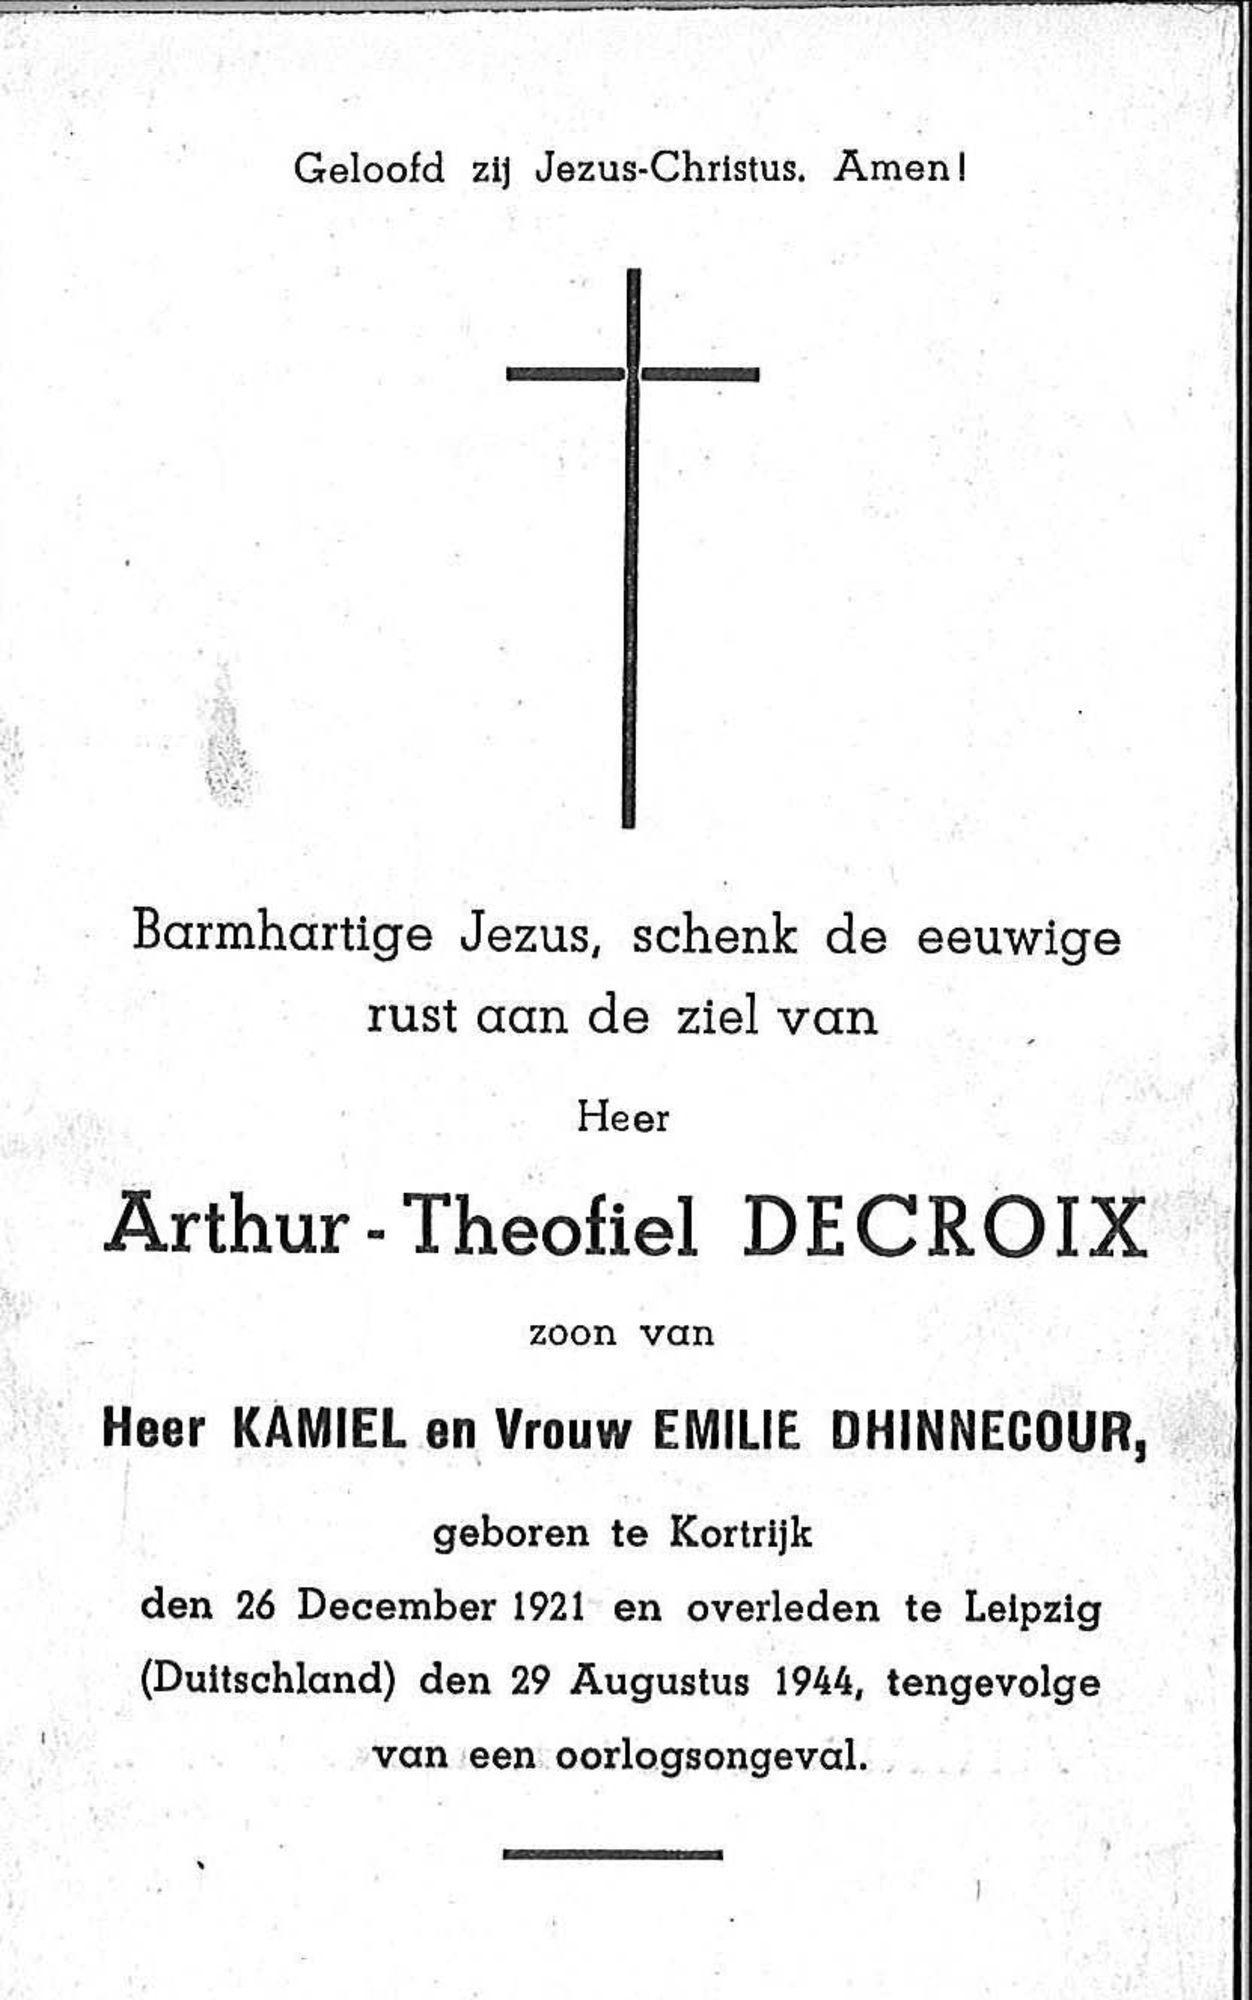 Arthur-Theofiel Decroix